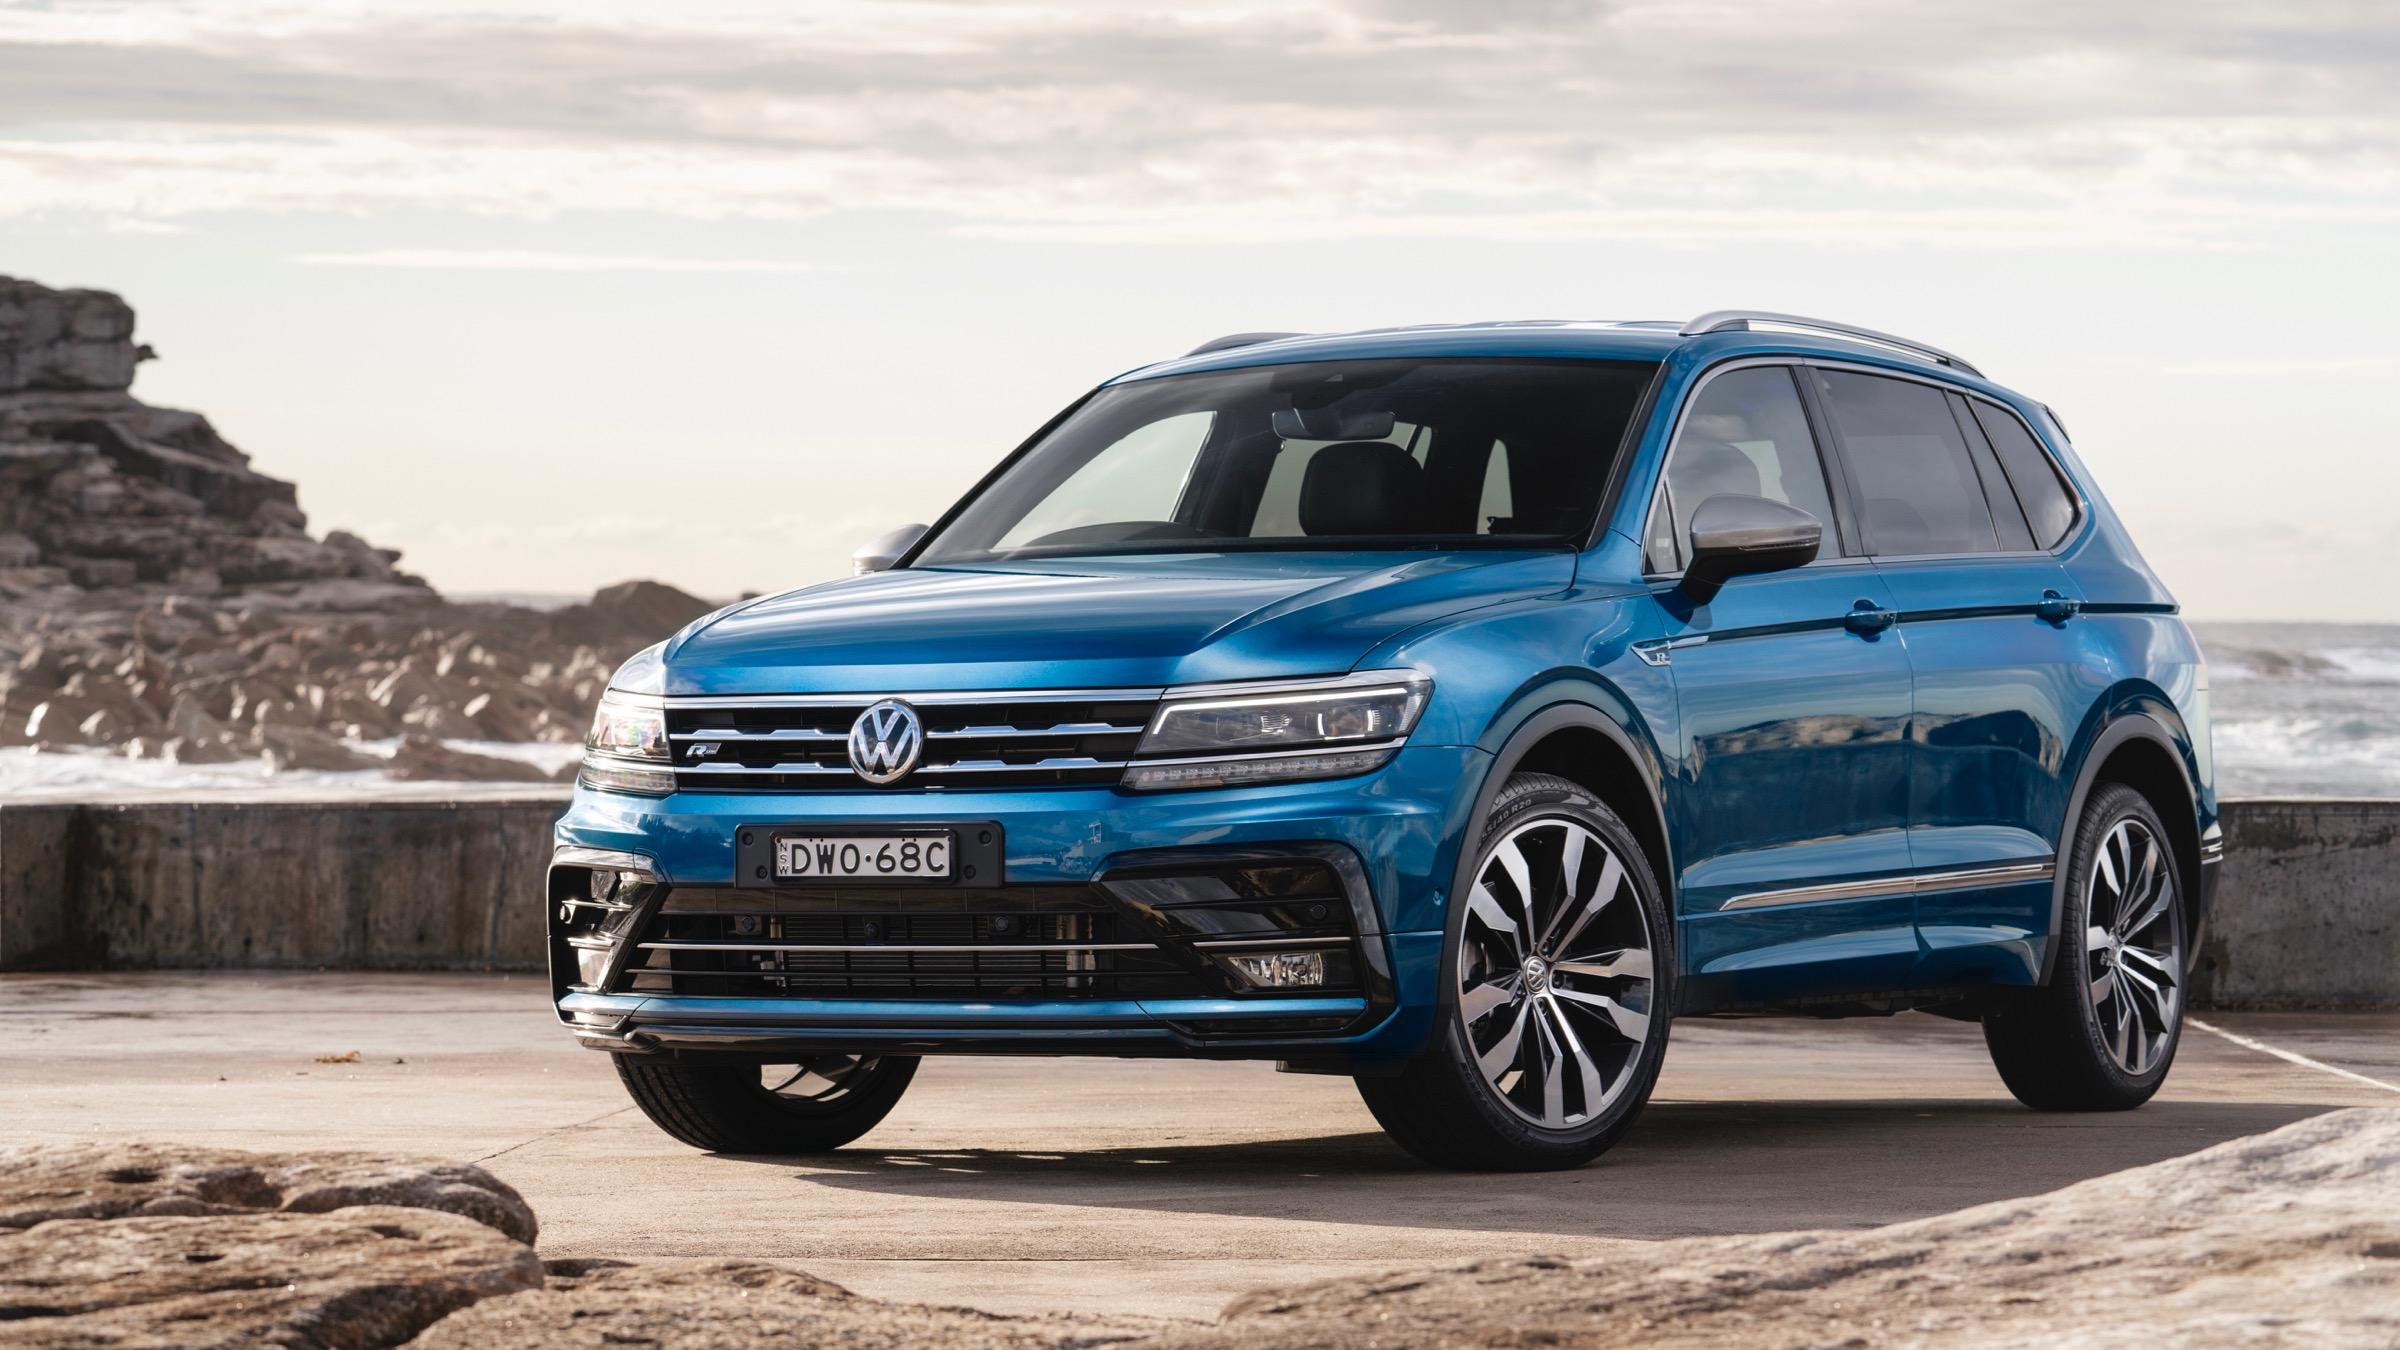 Volkswagen Tiguan Allspace 2018 review | Drive com au